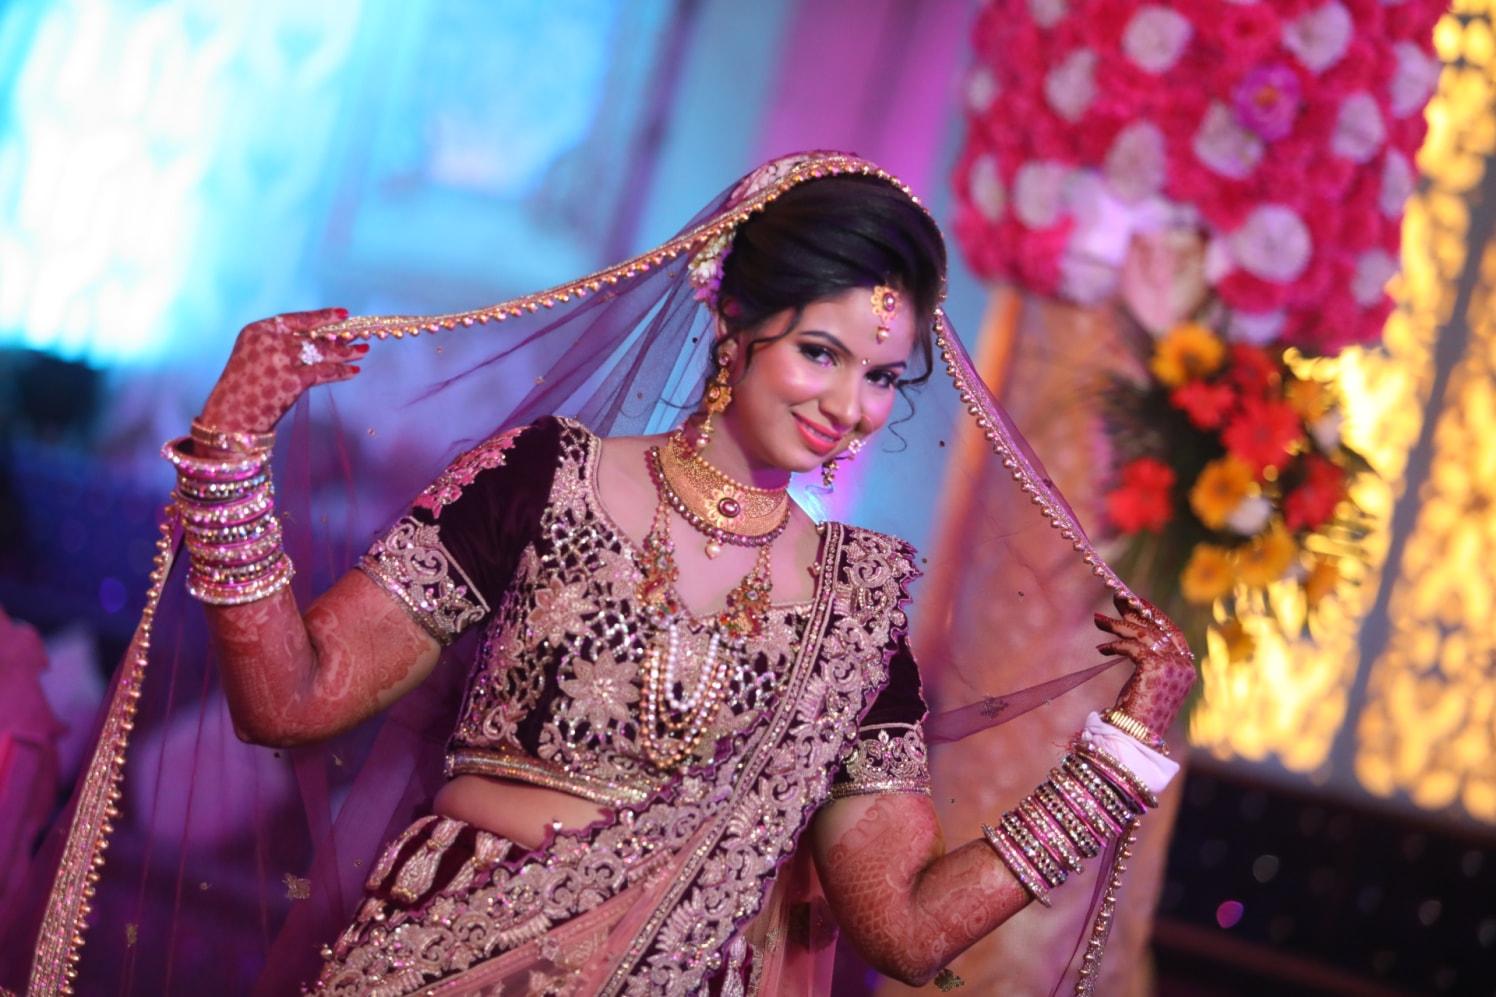 Bride Portrait Shot by The Action Photography Wedding-photography | Weddings Photos & Ideas